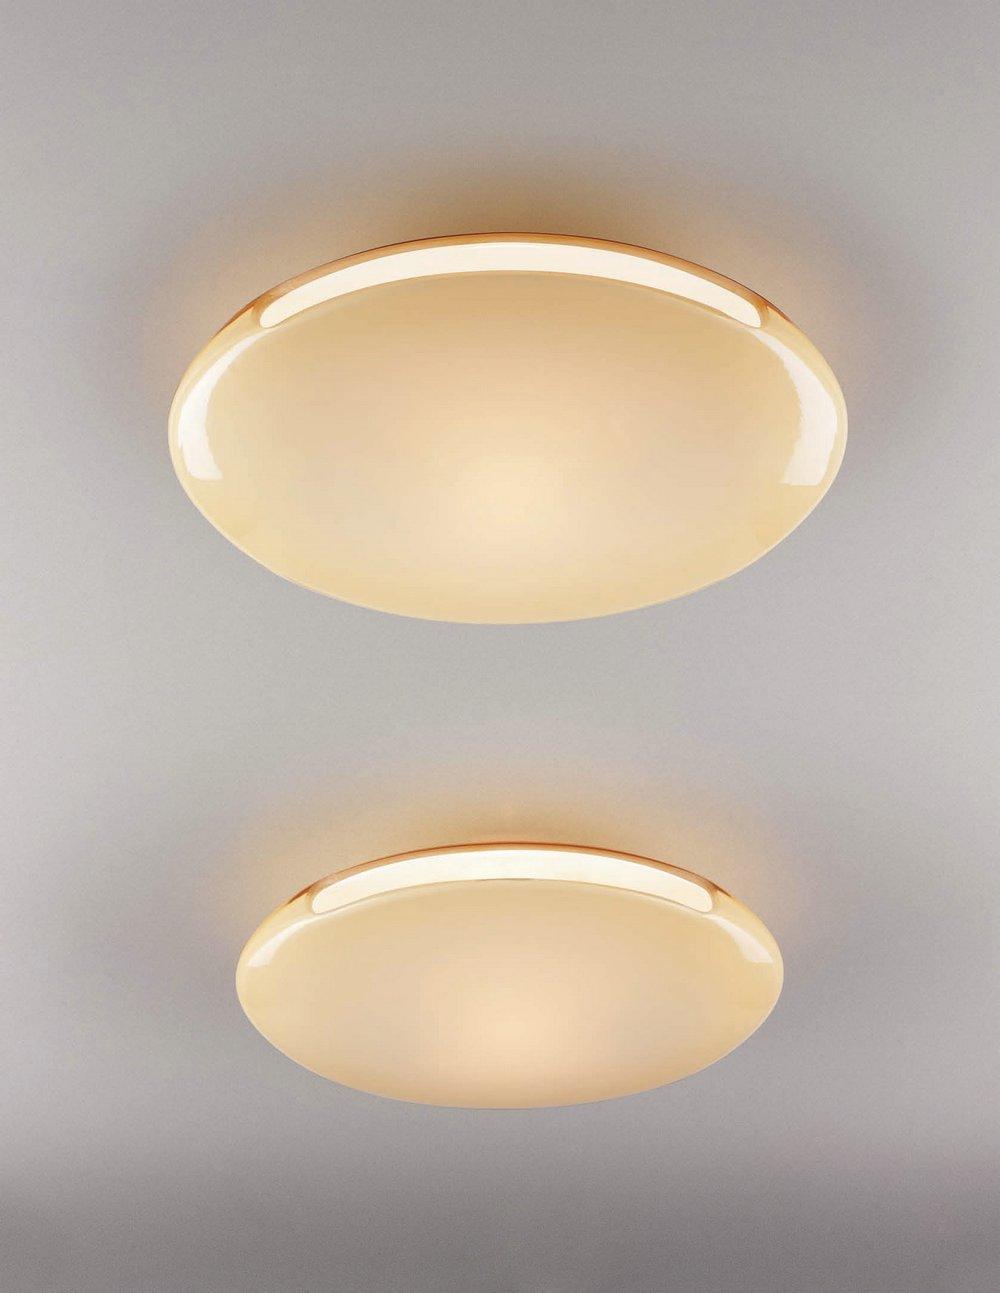 Easy Apliq Ceiling white Fluoresc,